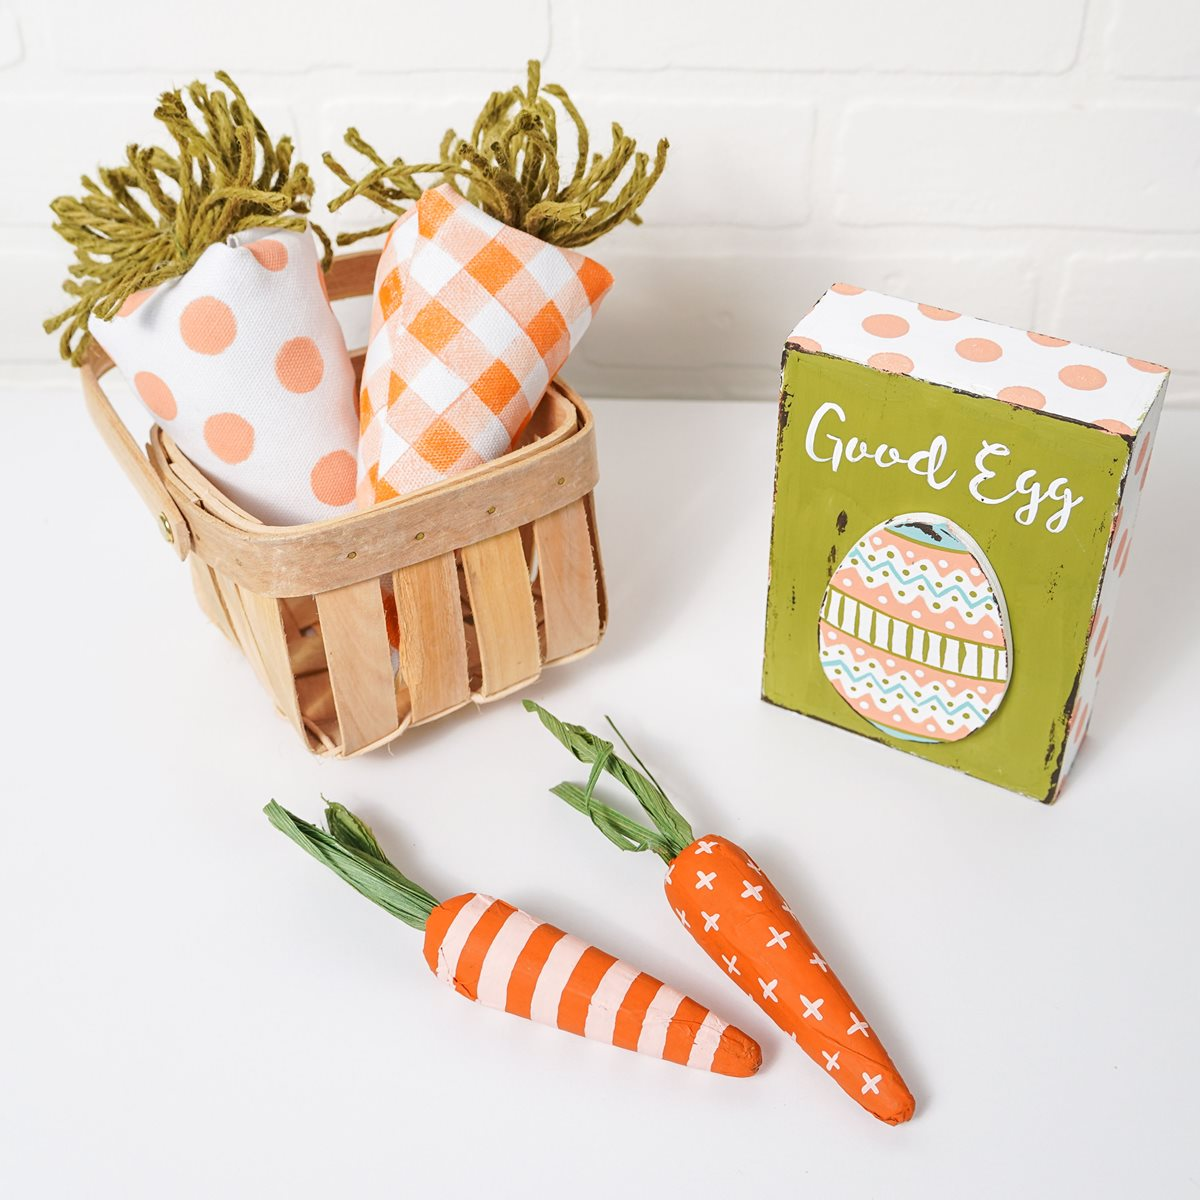 Patterned Stuffed Carrots